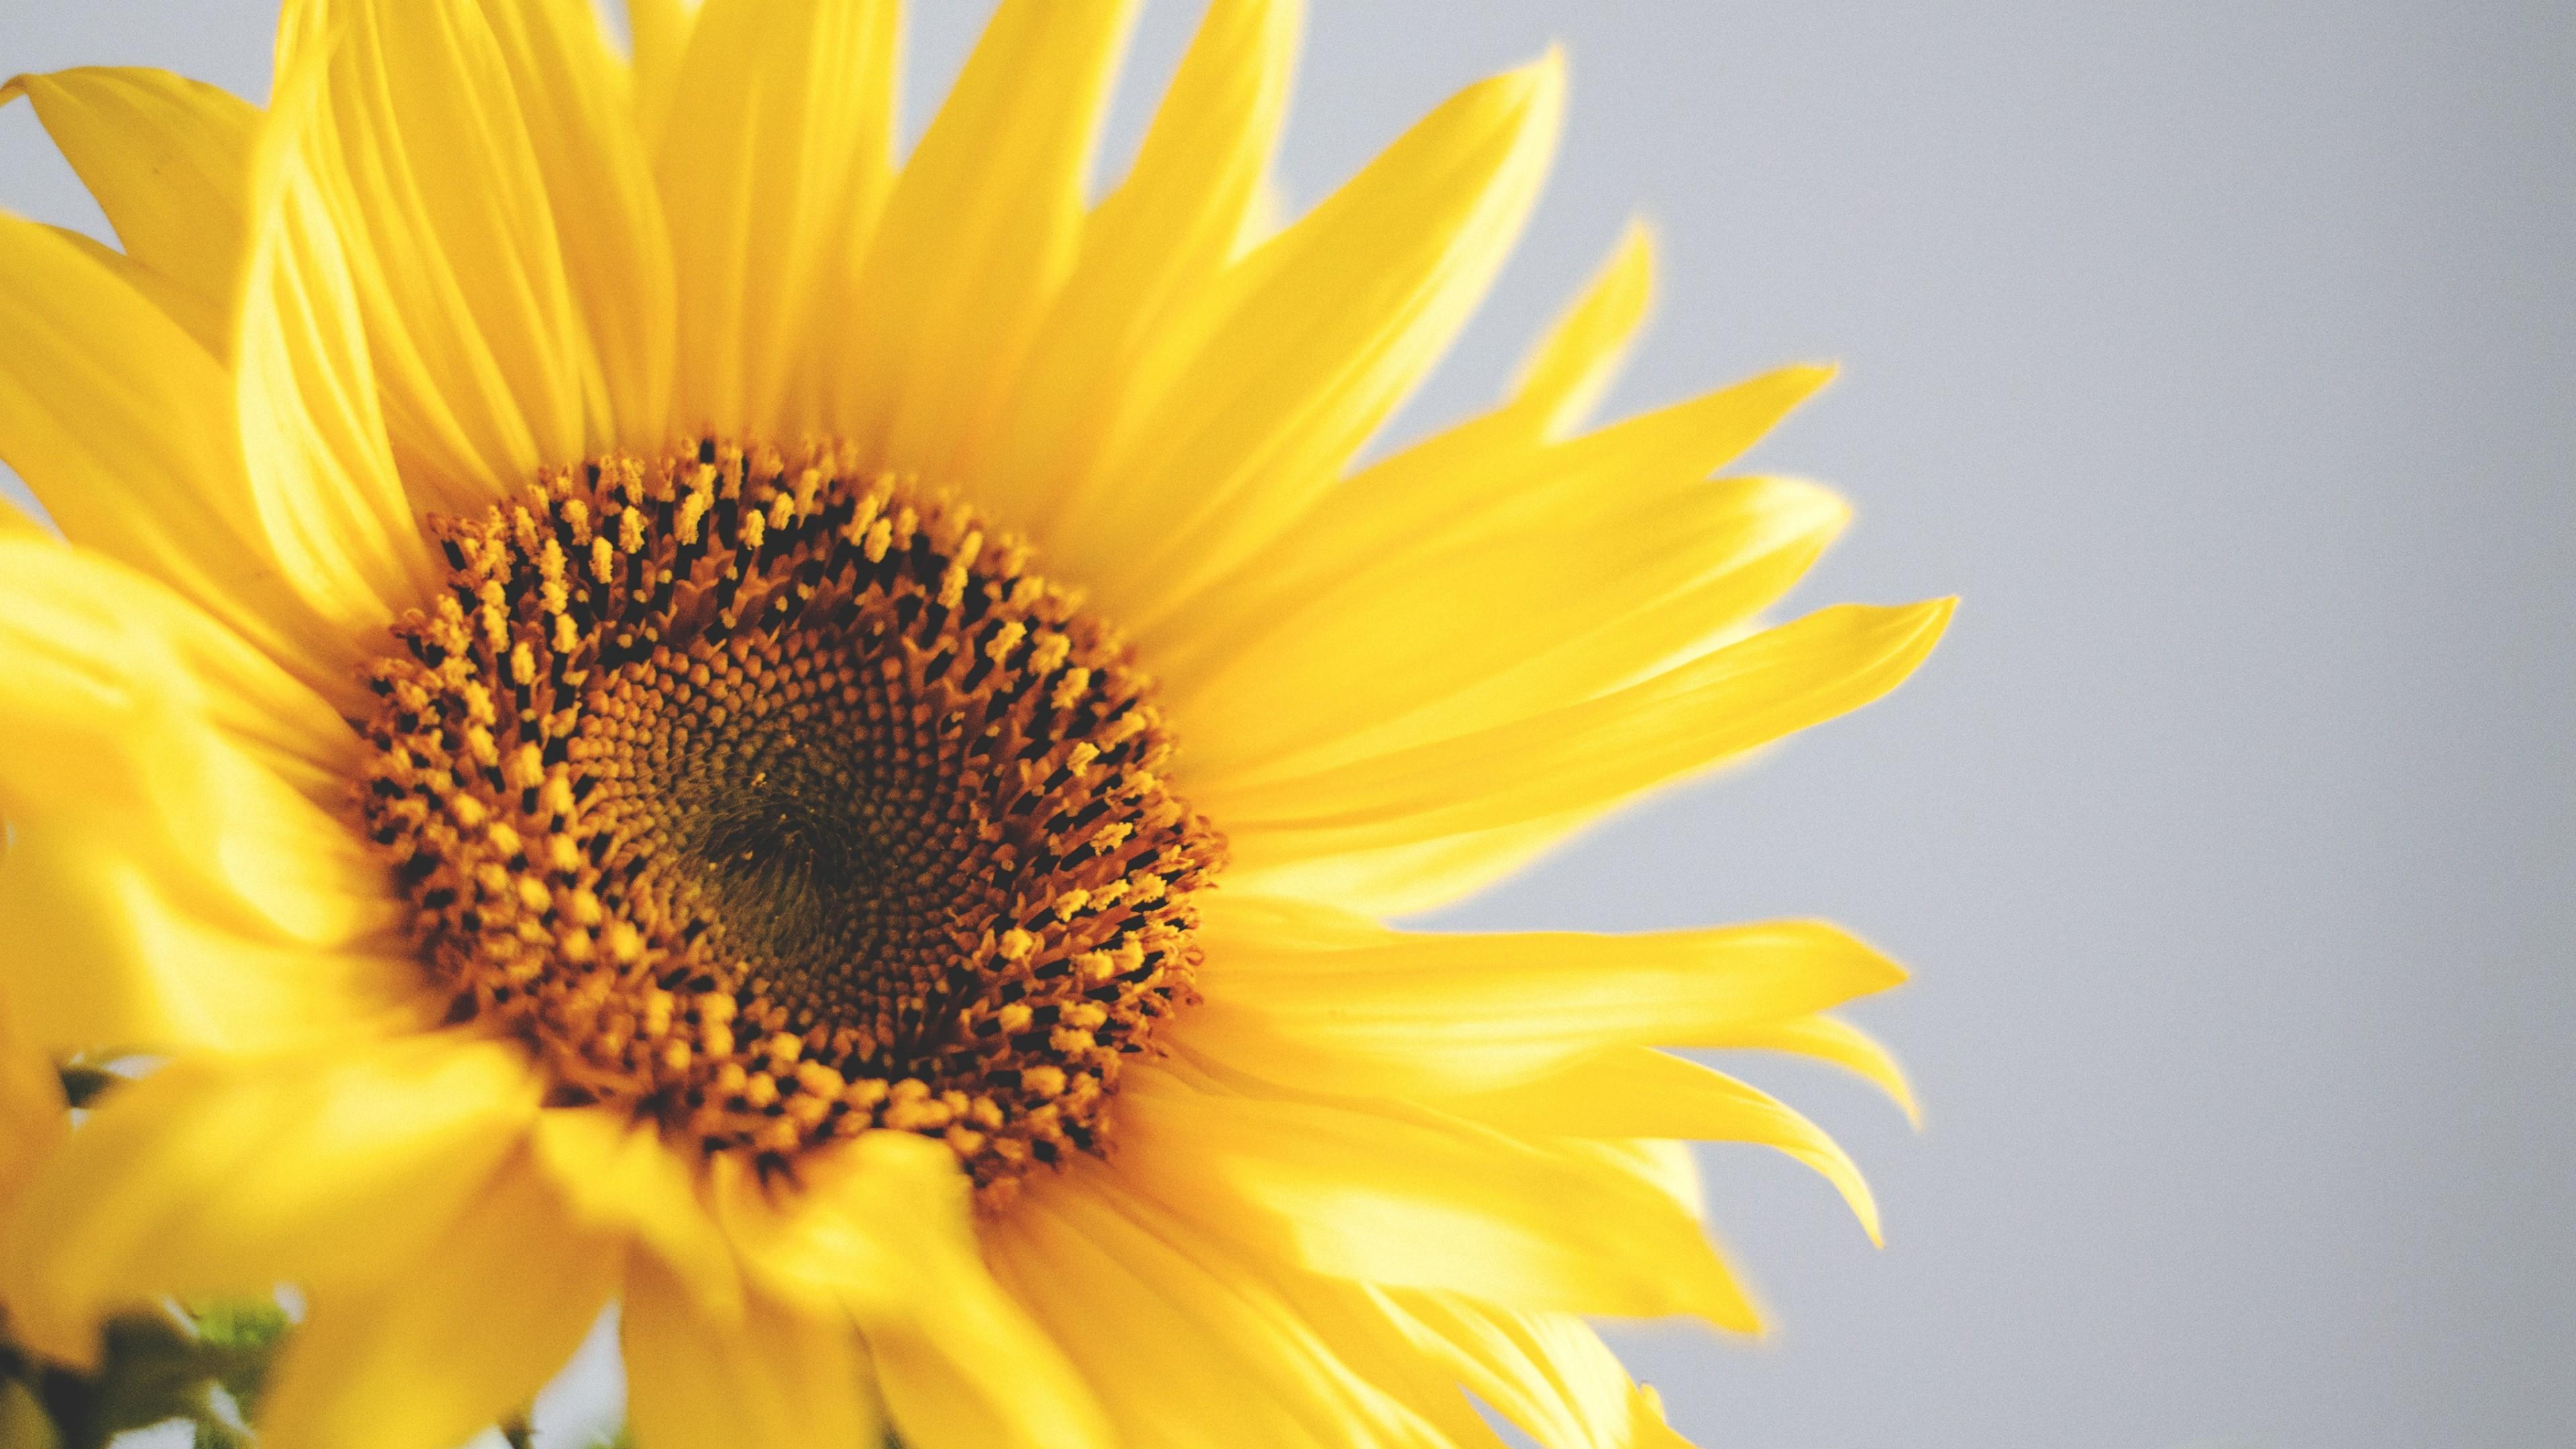 Wallpaper Sunflower 5k 4k Wallpaper Yellow Nature 12582